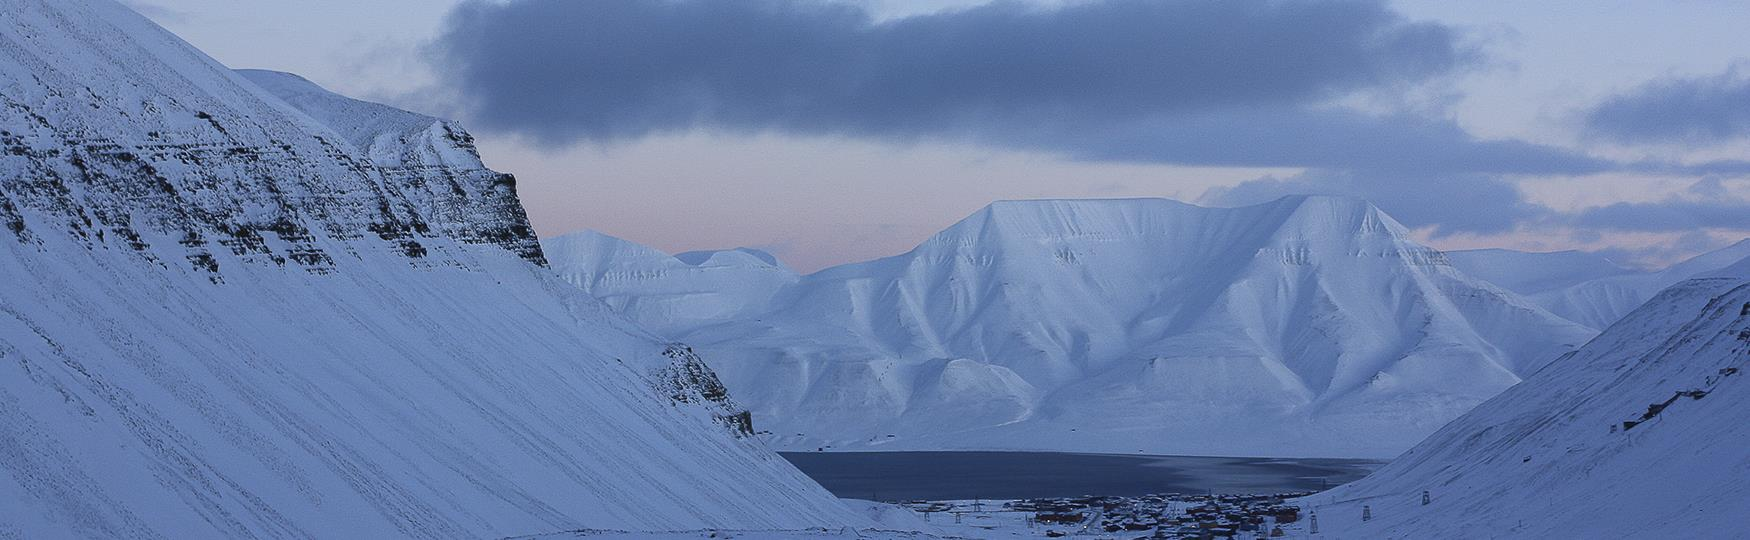 Svalbard destinations